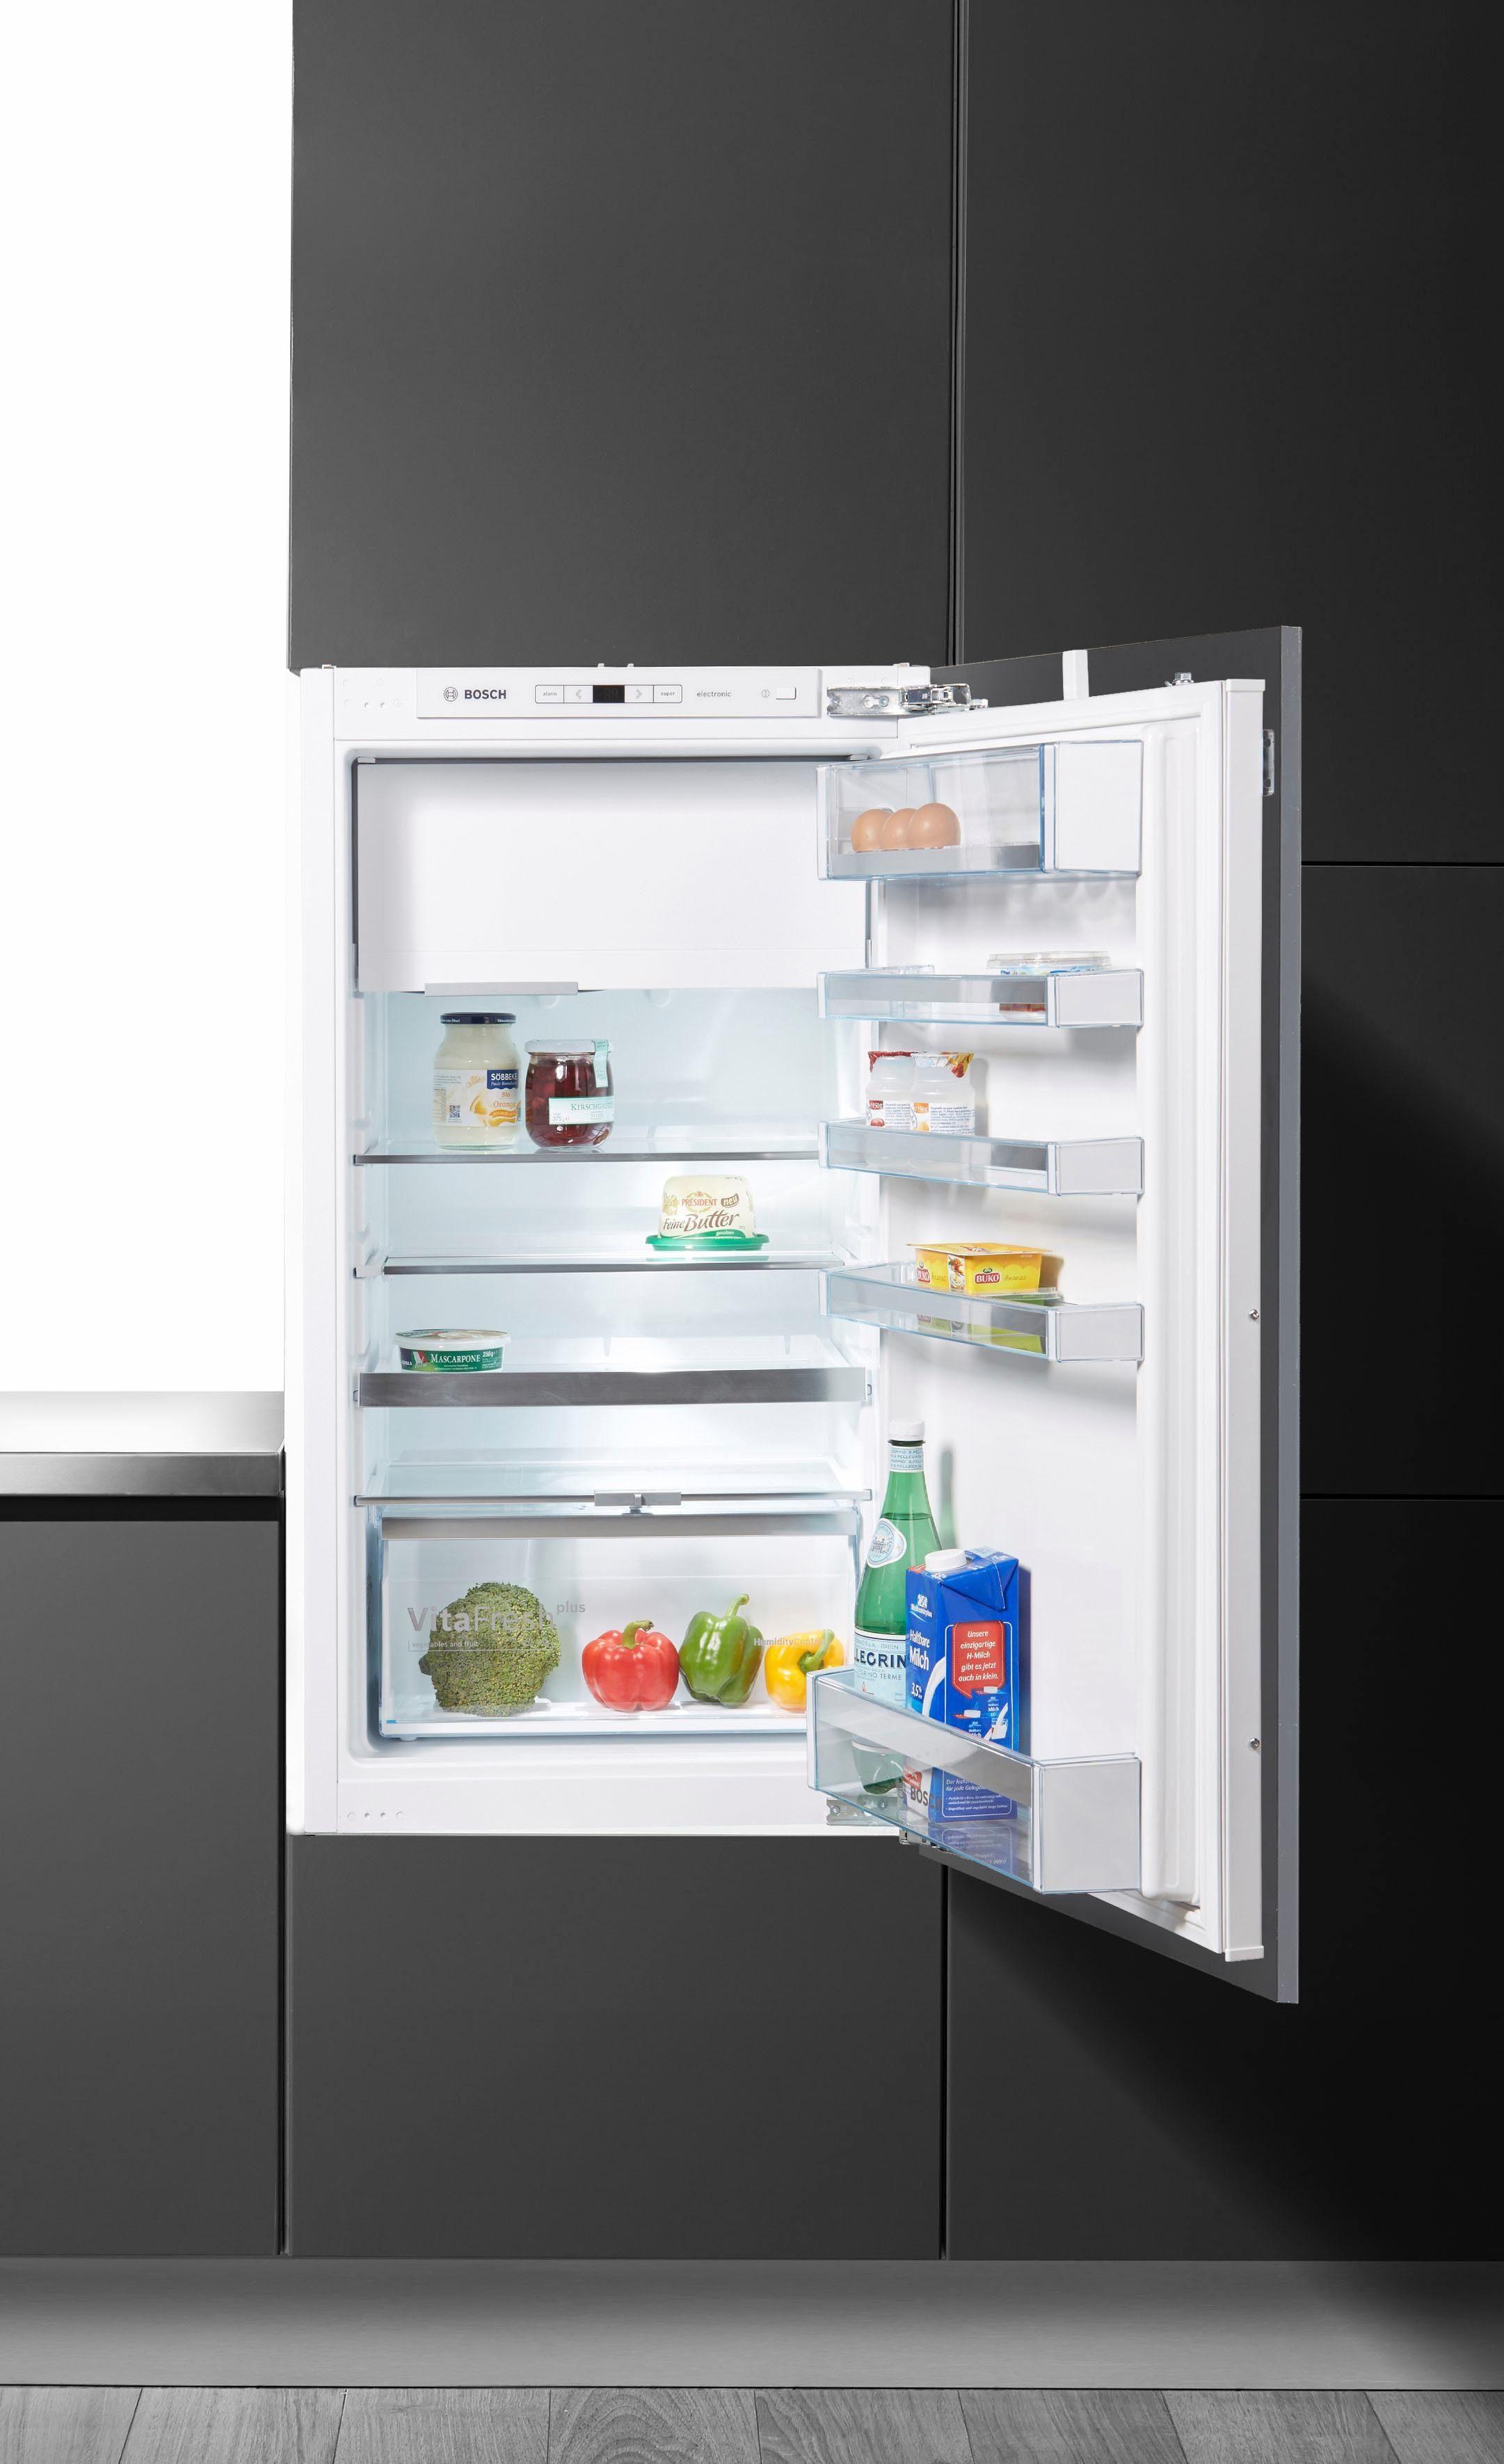 BOSCH Einbaukühlschrank KIL32AF30, 102,1 cm hoch, 55,8 cm breit, A++, 102,1 cm